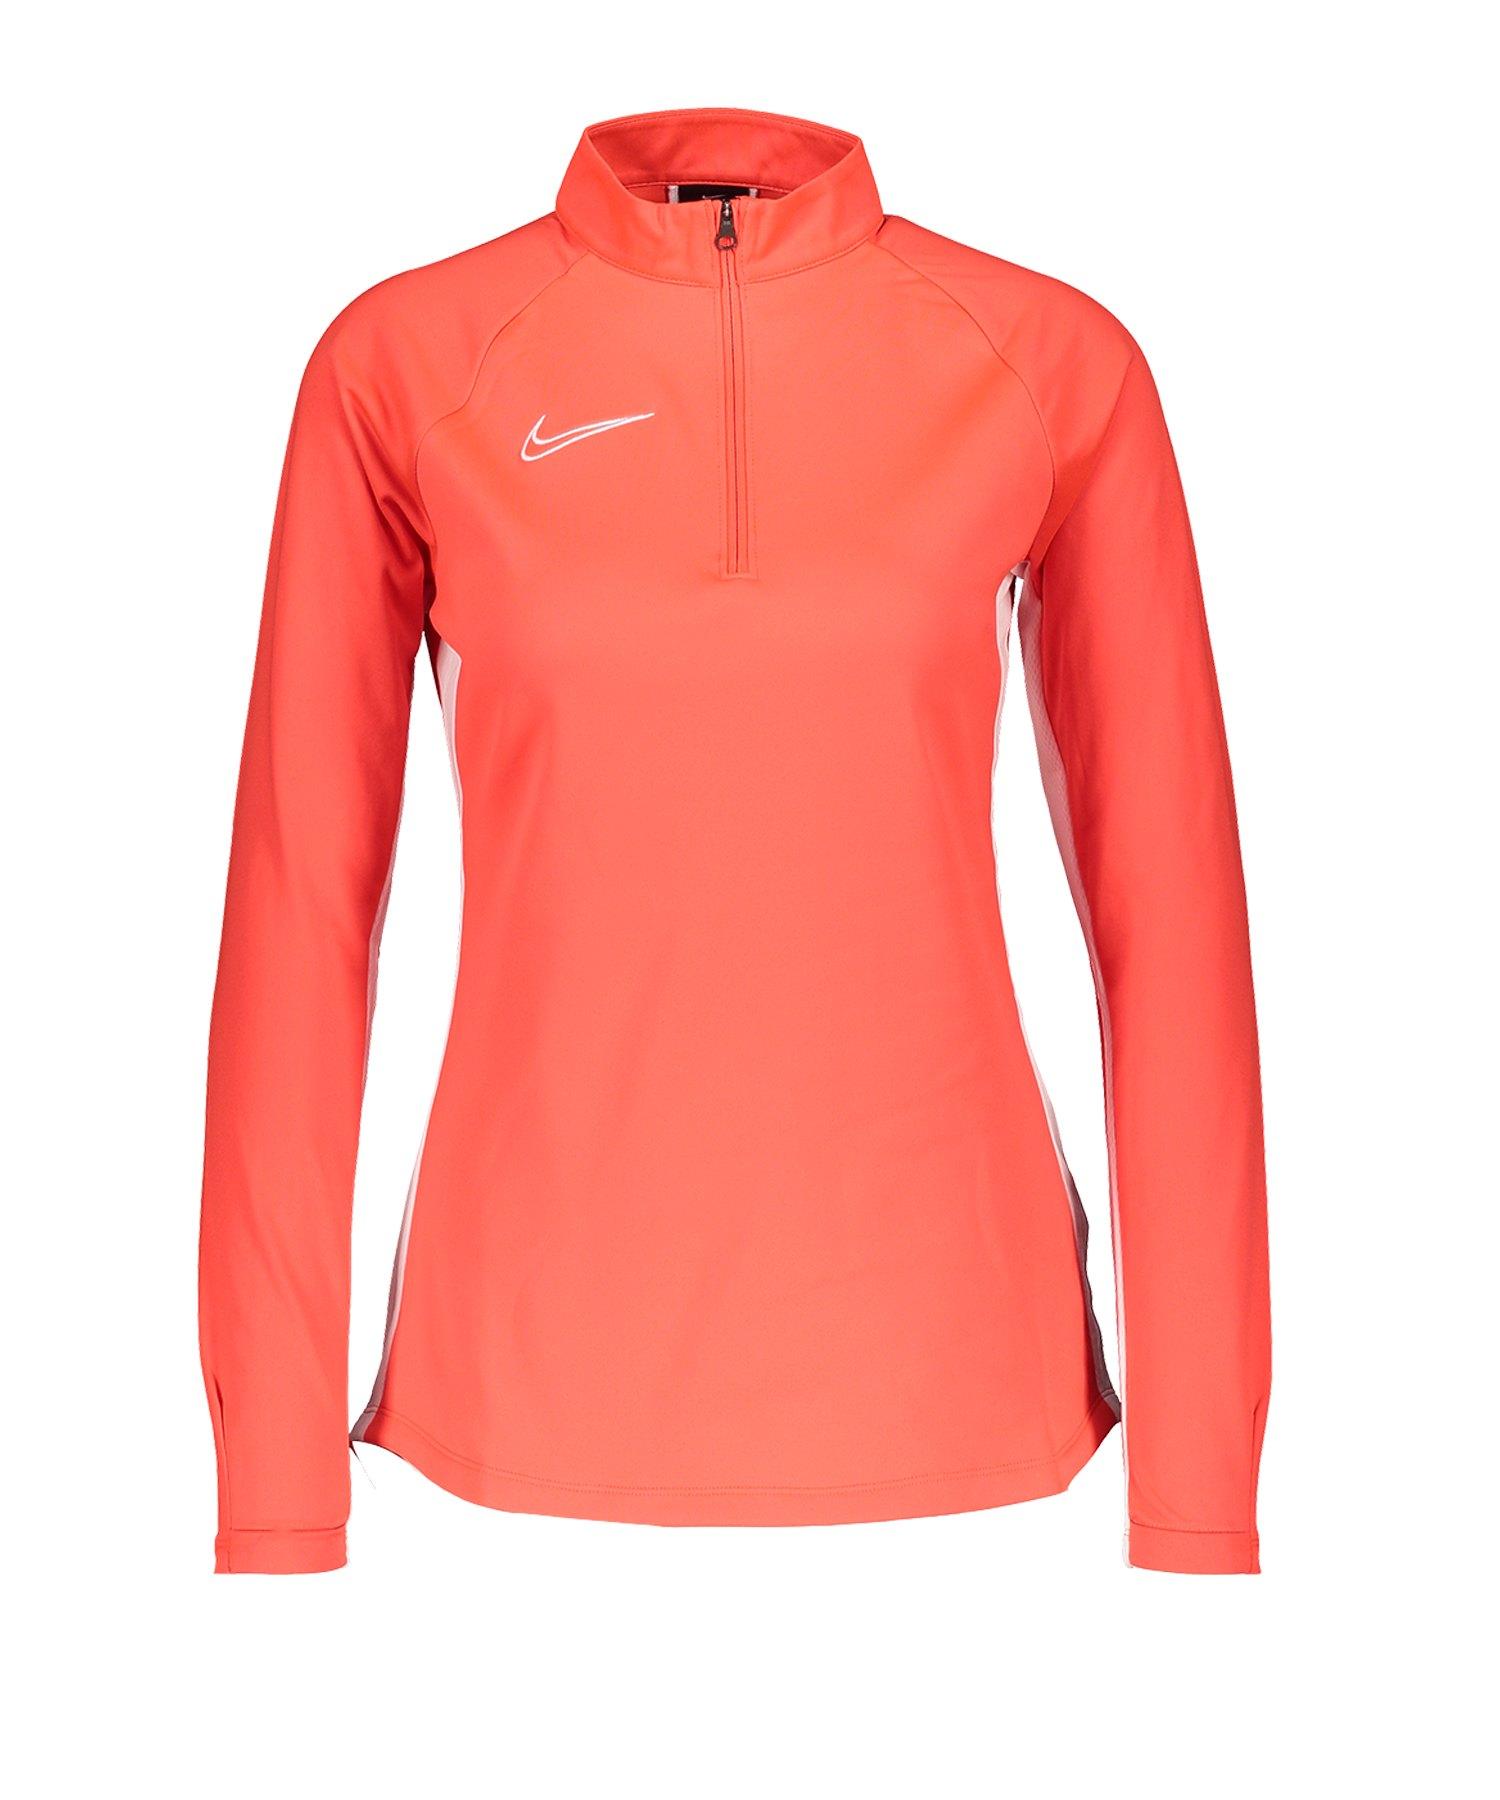 Nike Academy 19 Drill Top Sweatshirt Damen F671 - rot